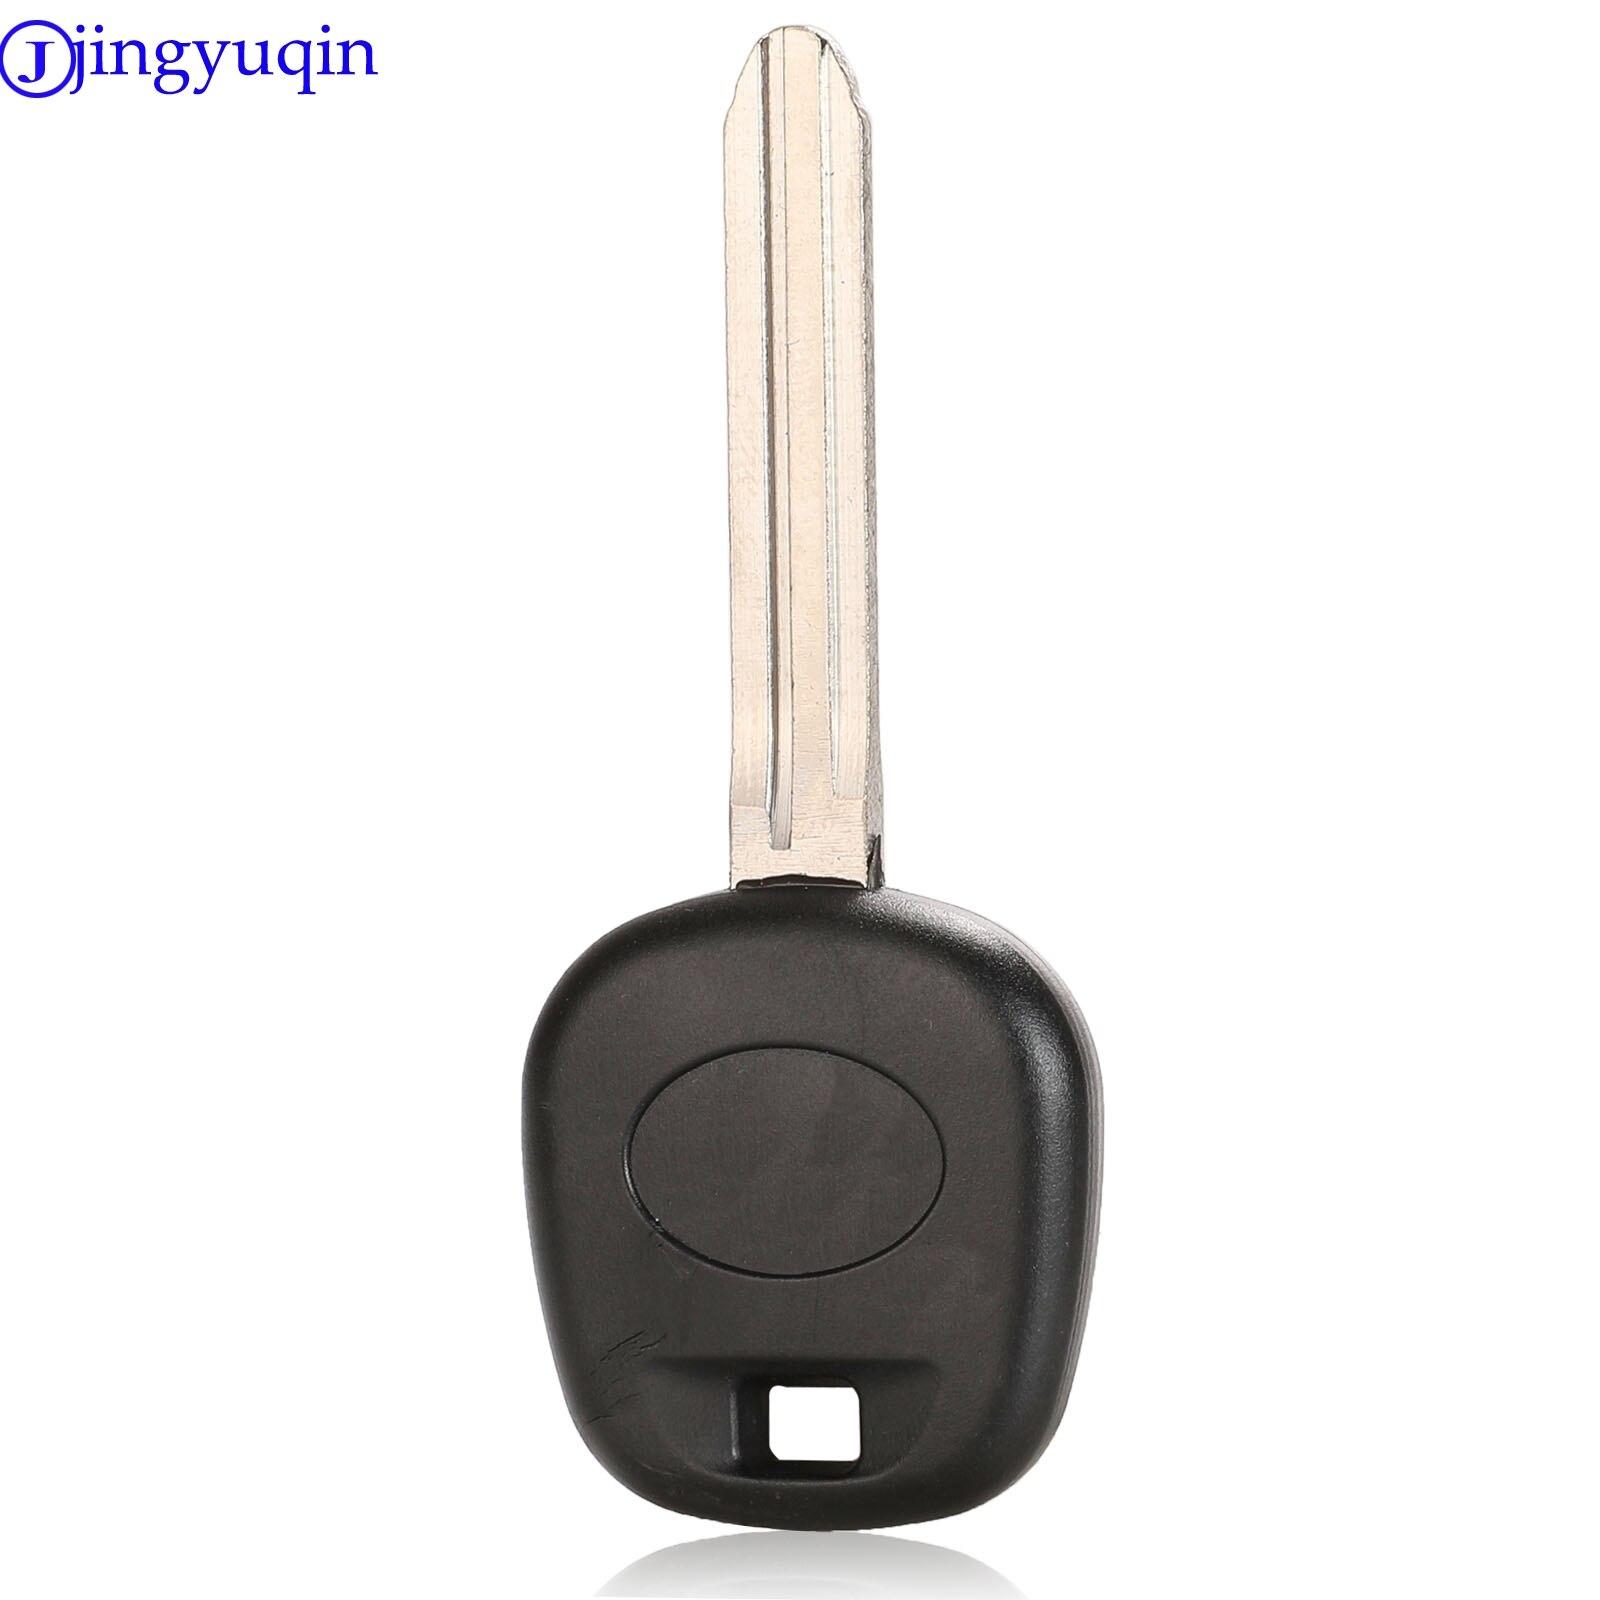 jingyuqin Transponder Blank Key Shell For Toyota Rav4 Prado Corolla Camry Reiz Highlander Yaris Corolla With TOY43 Blade